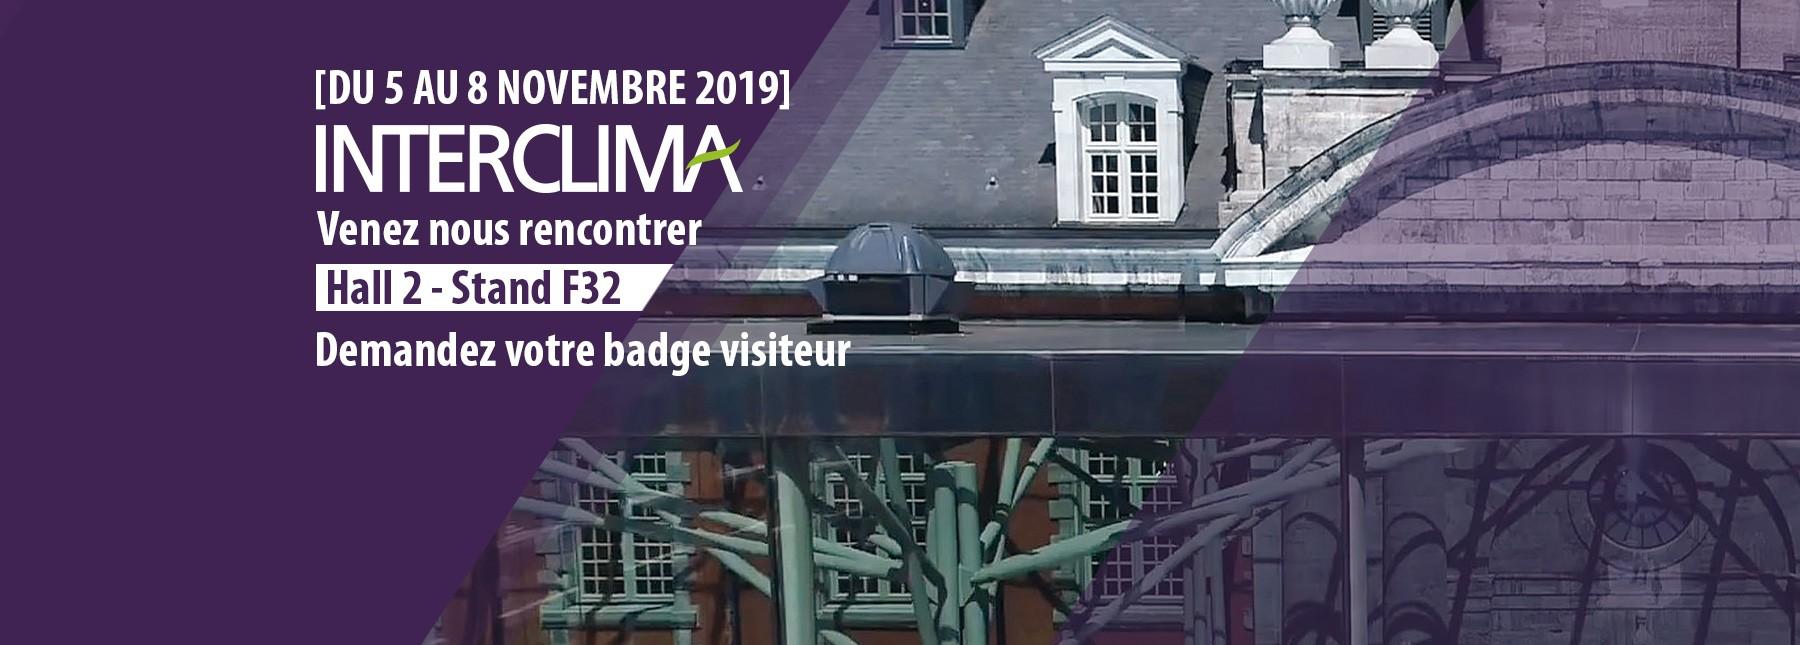 INTERCLIMA 2019 - Accès demande de badge